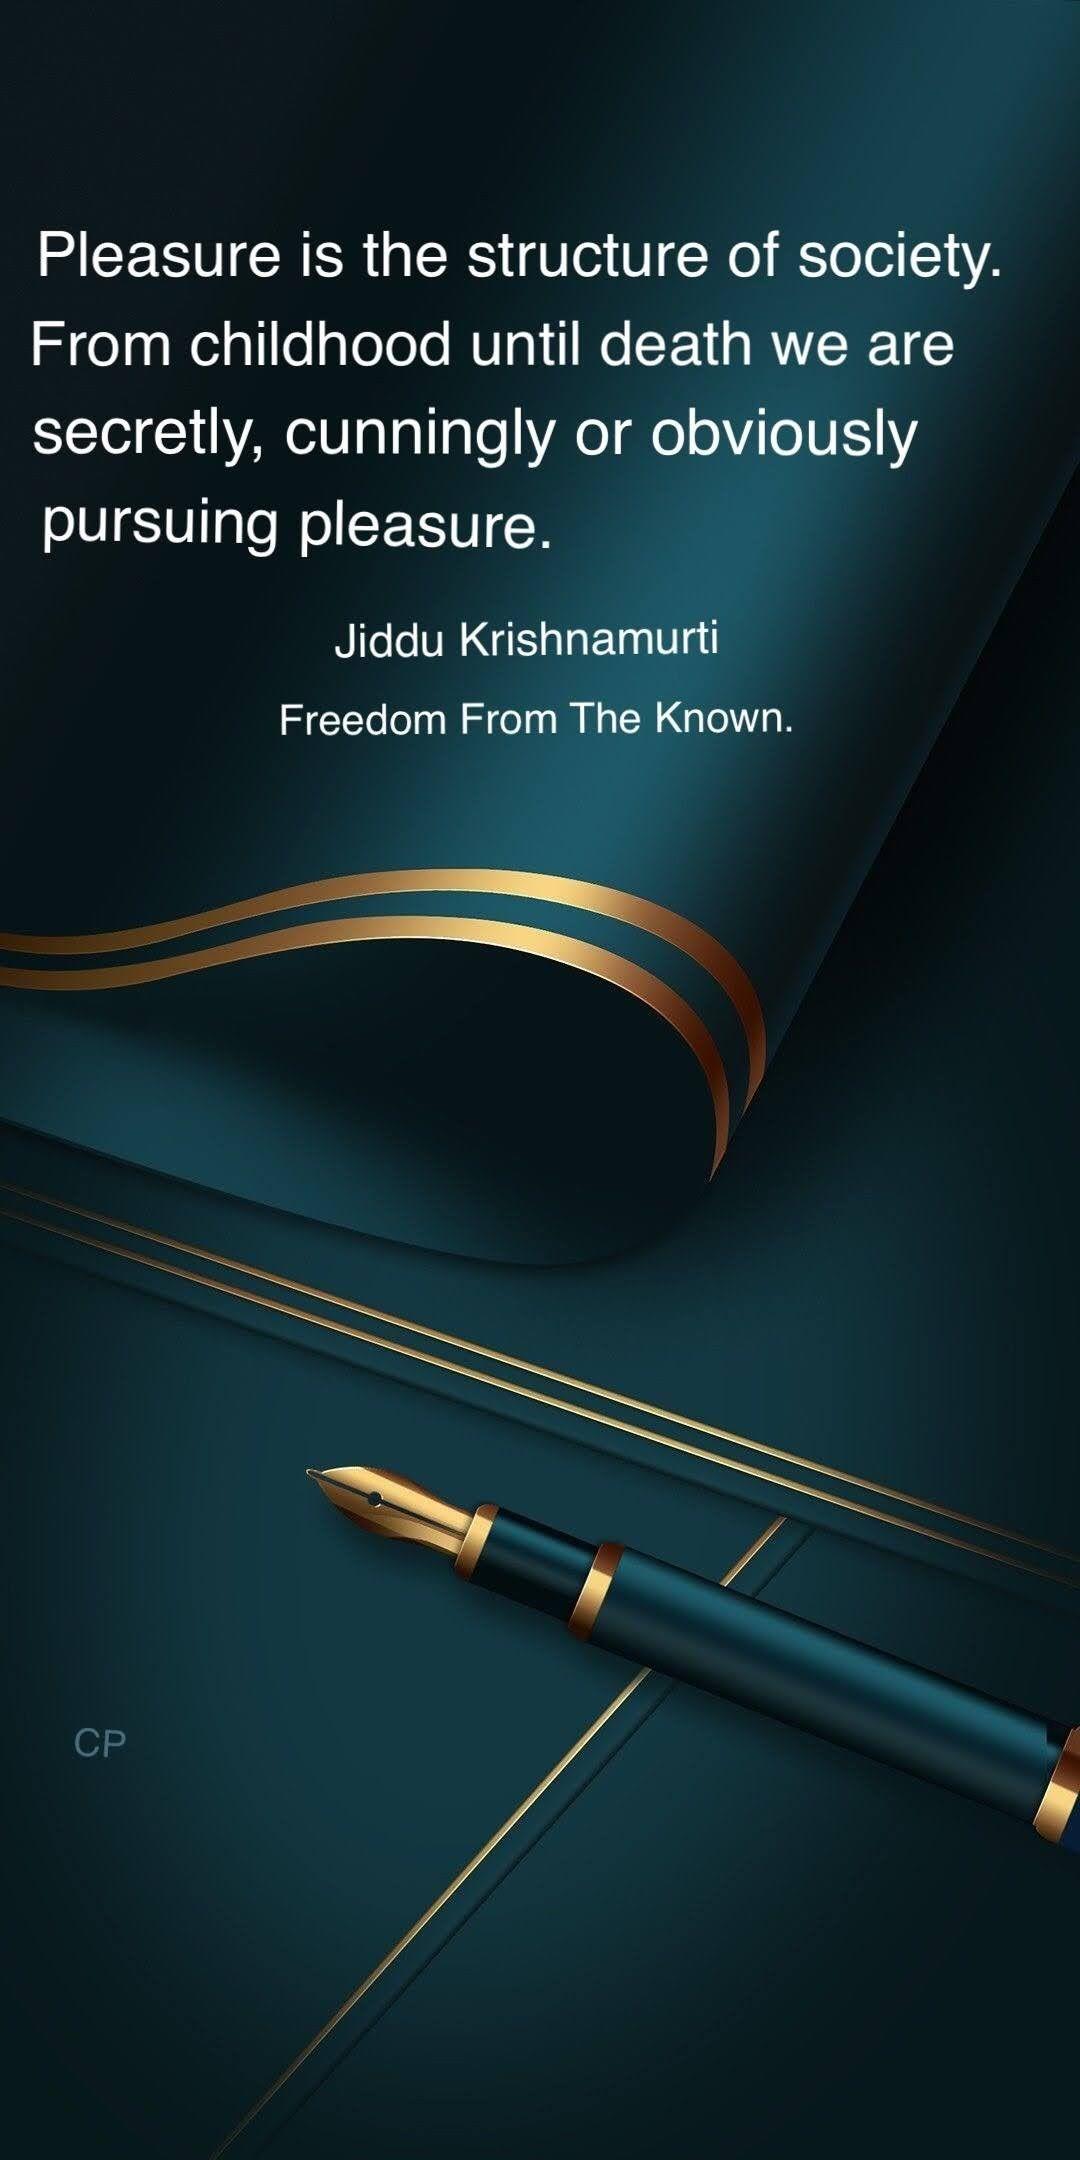 Pin By Sach Mere Yaar Hai Bas Vahi Py On J K Jiddu Krishnamurti Freedom From The Known Society